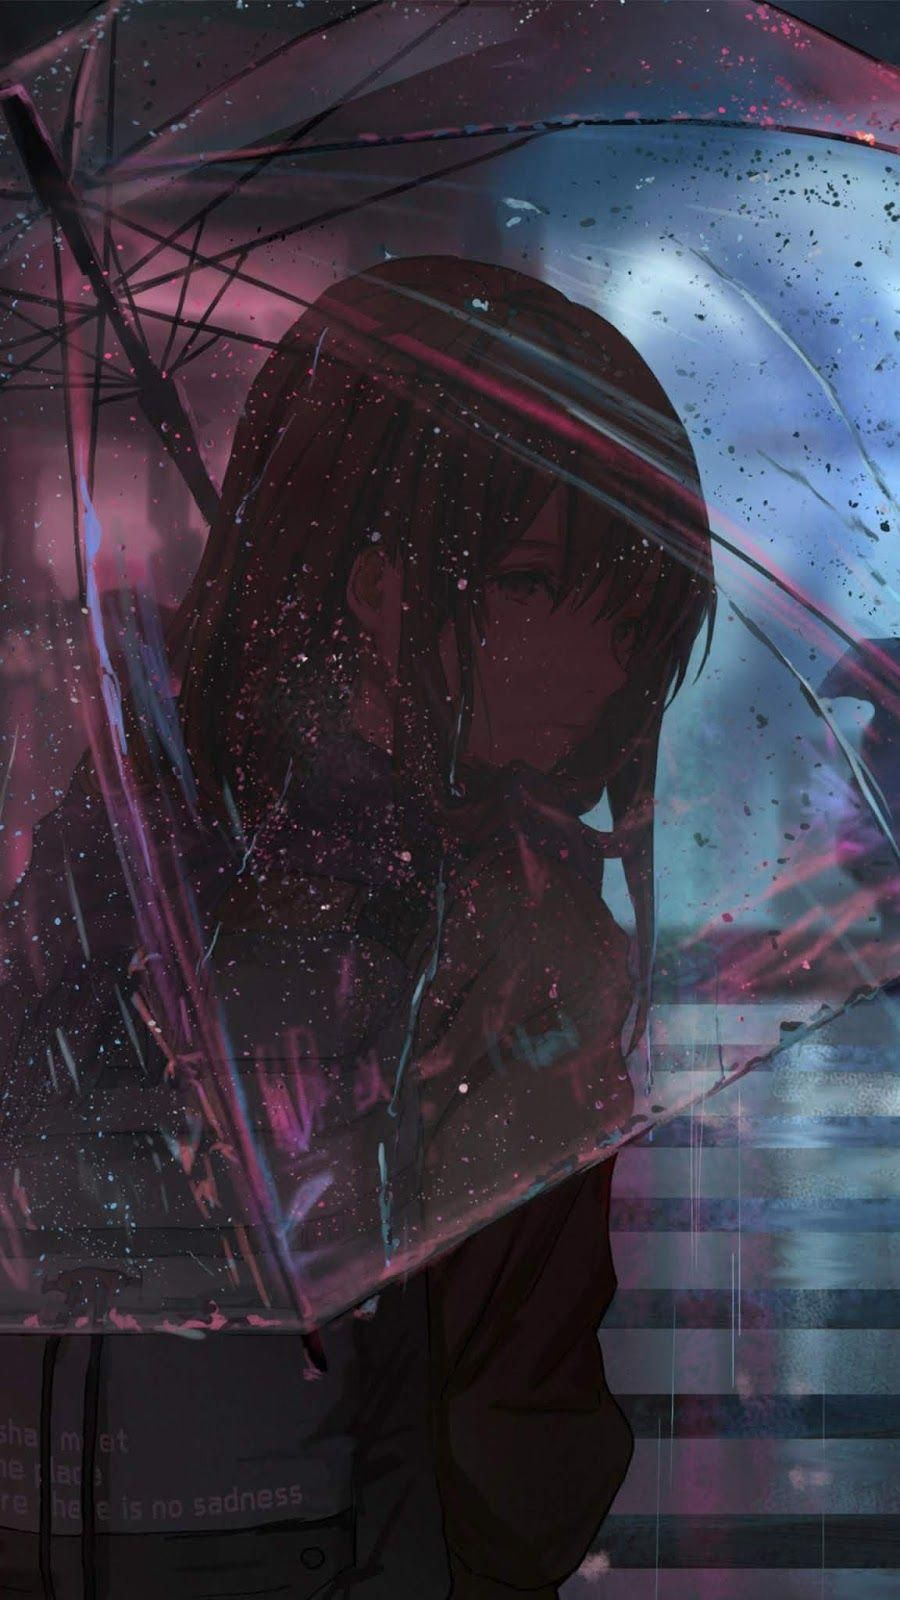 Sweet Magic Wallpapers 4k para Celular Animes e Artwoks